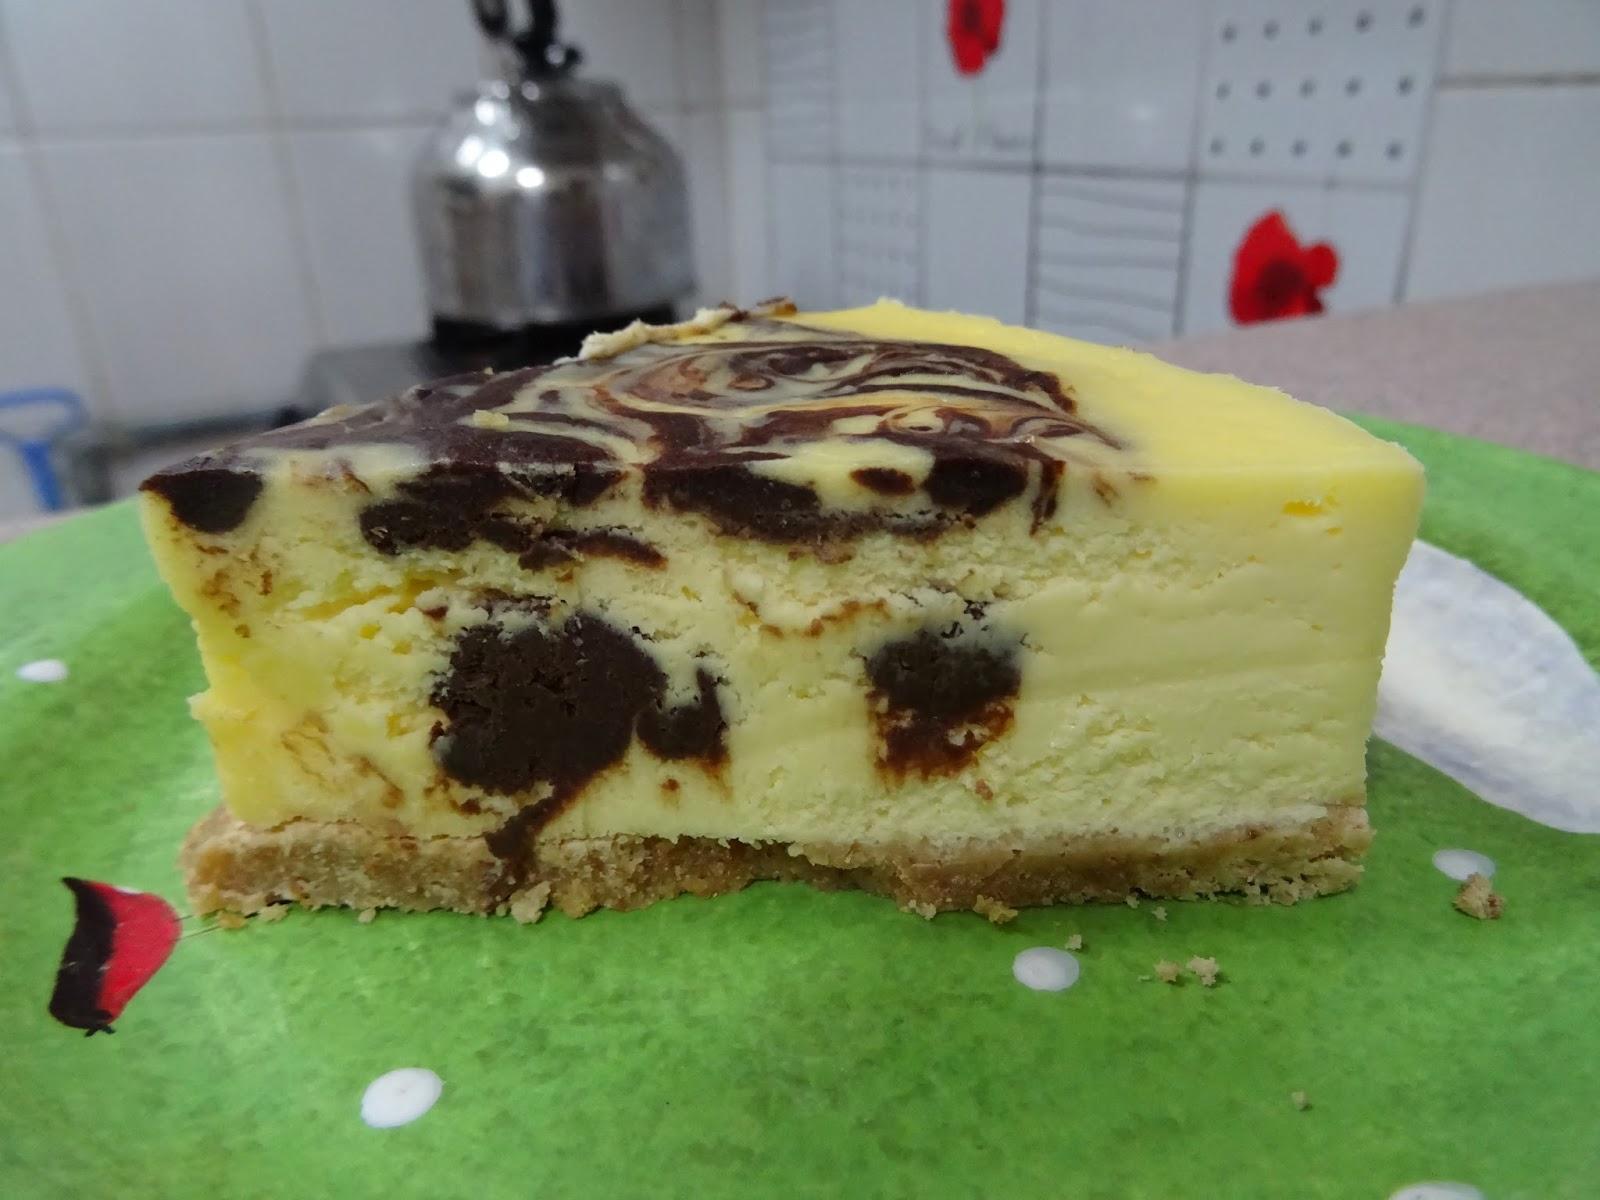 Owenmama's Kitchen: 雲石紋芝士蛋糕